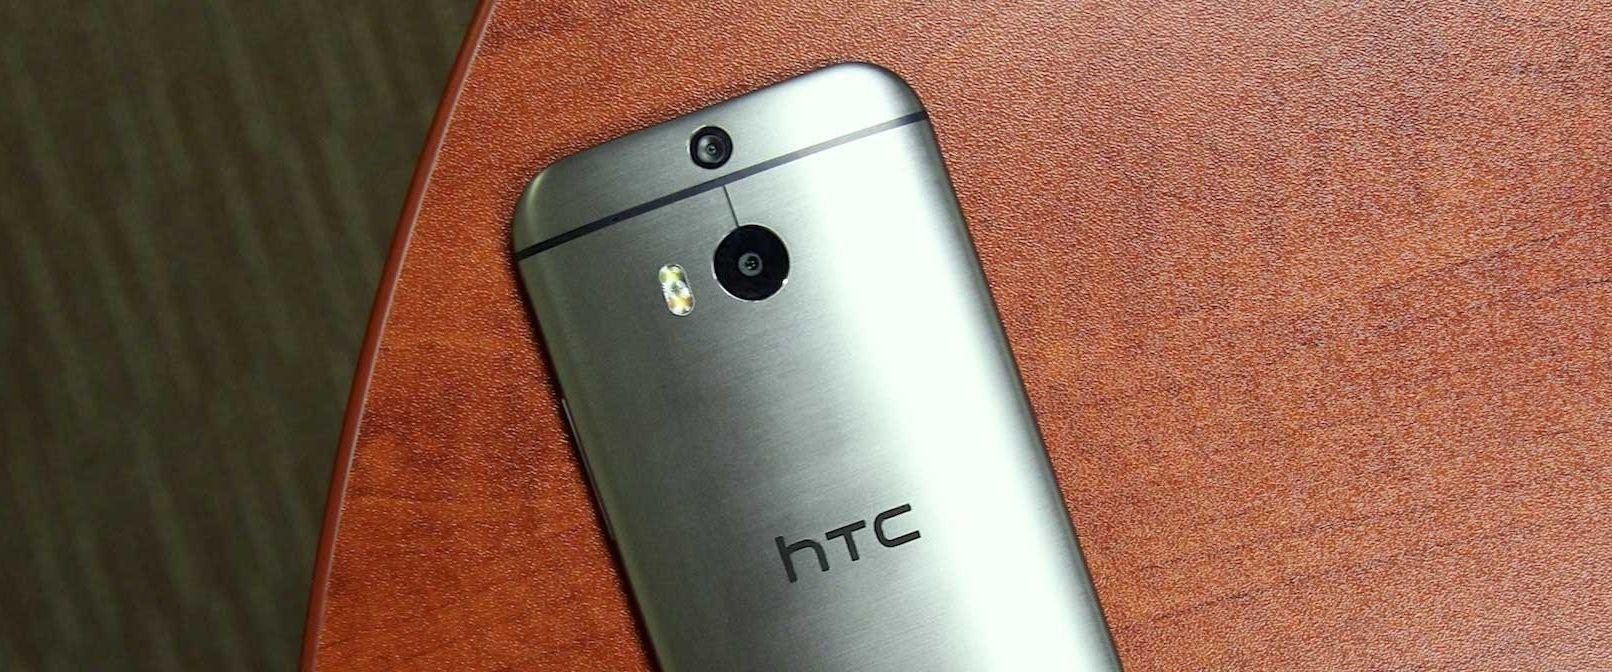 Дополнительная камера HTC One M8